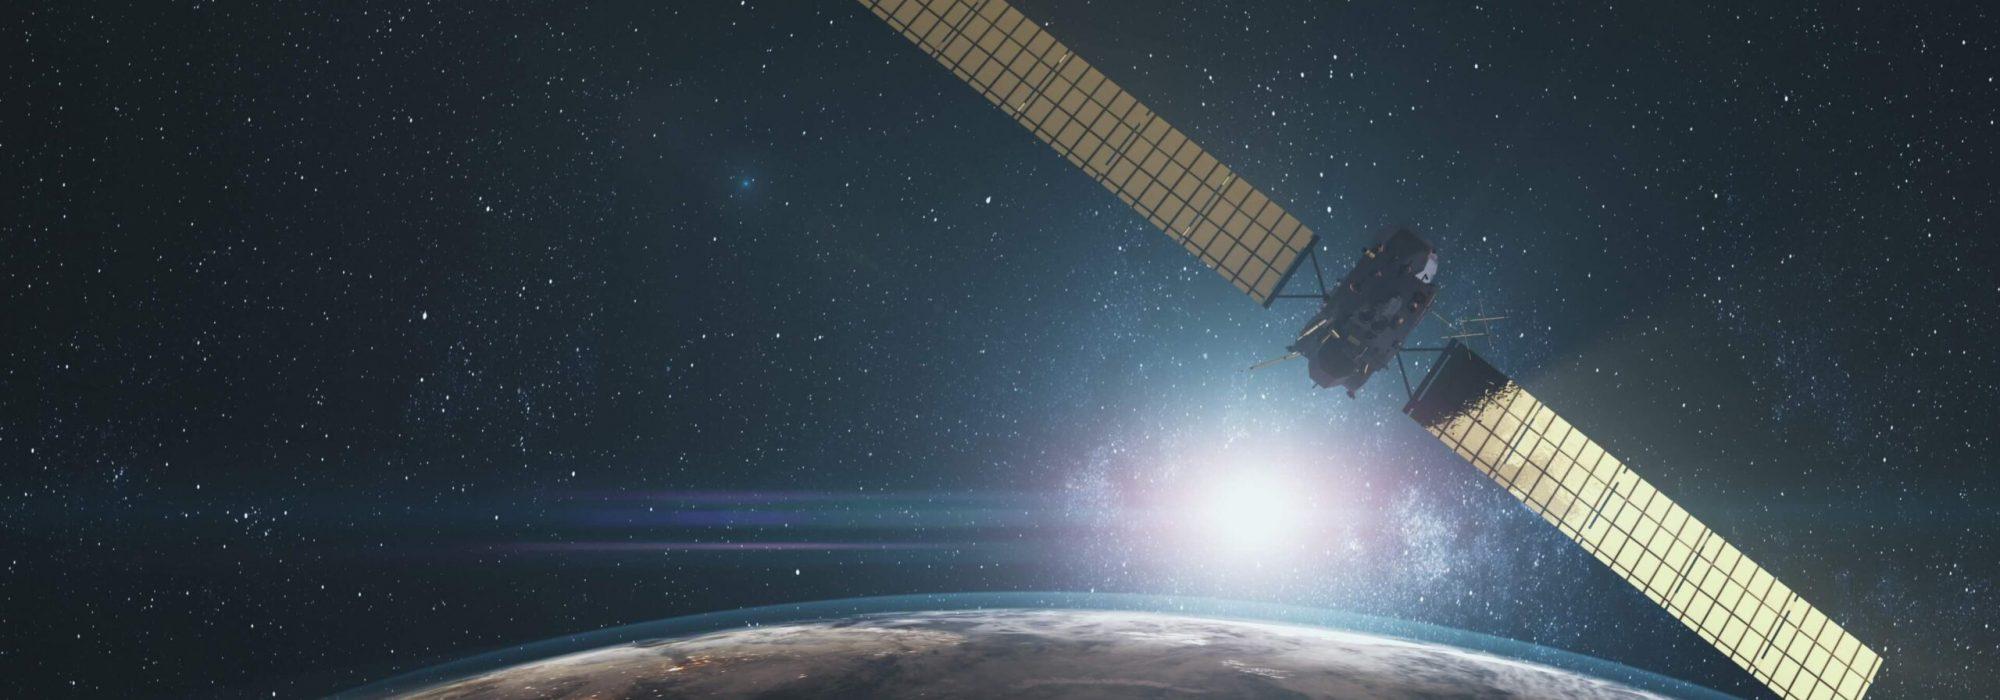 modern-space-probe-flying-near-rotating-planet-X3LNFSW